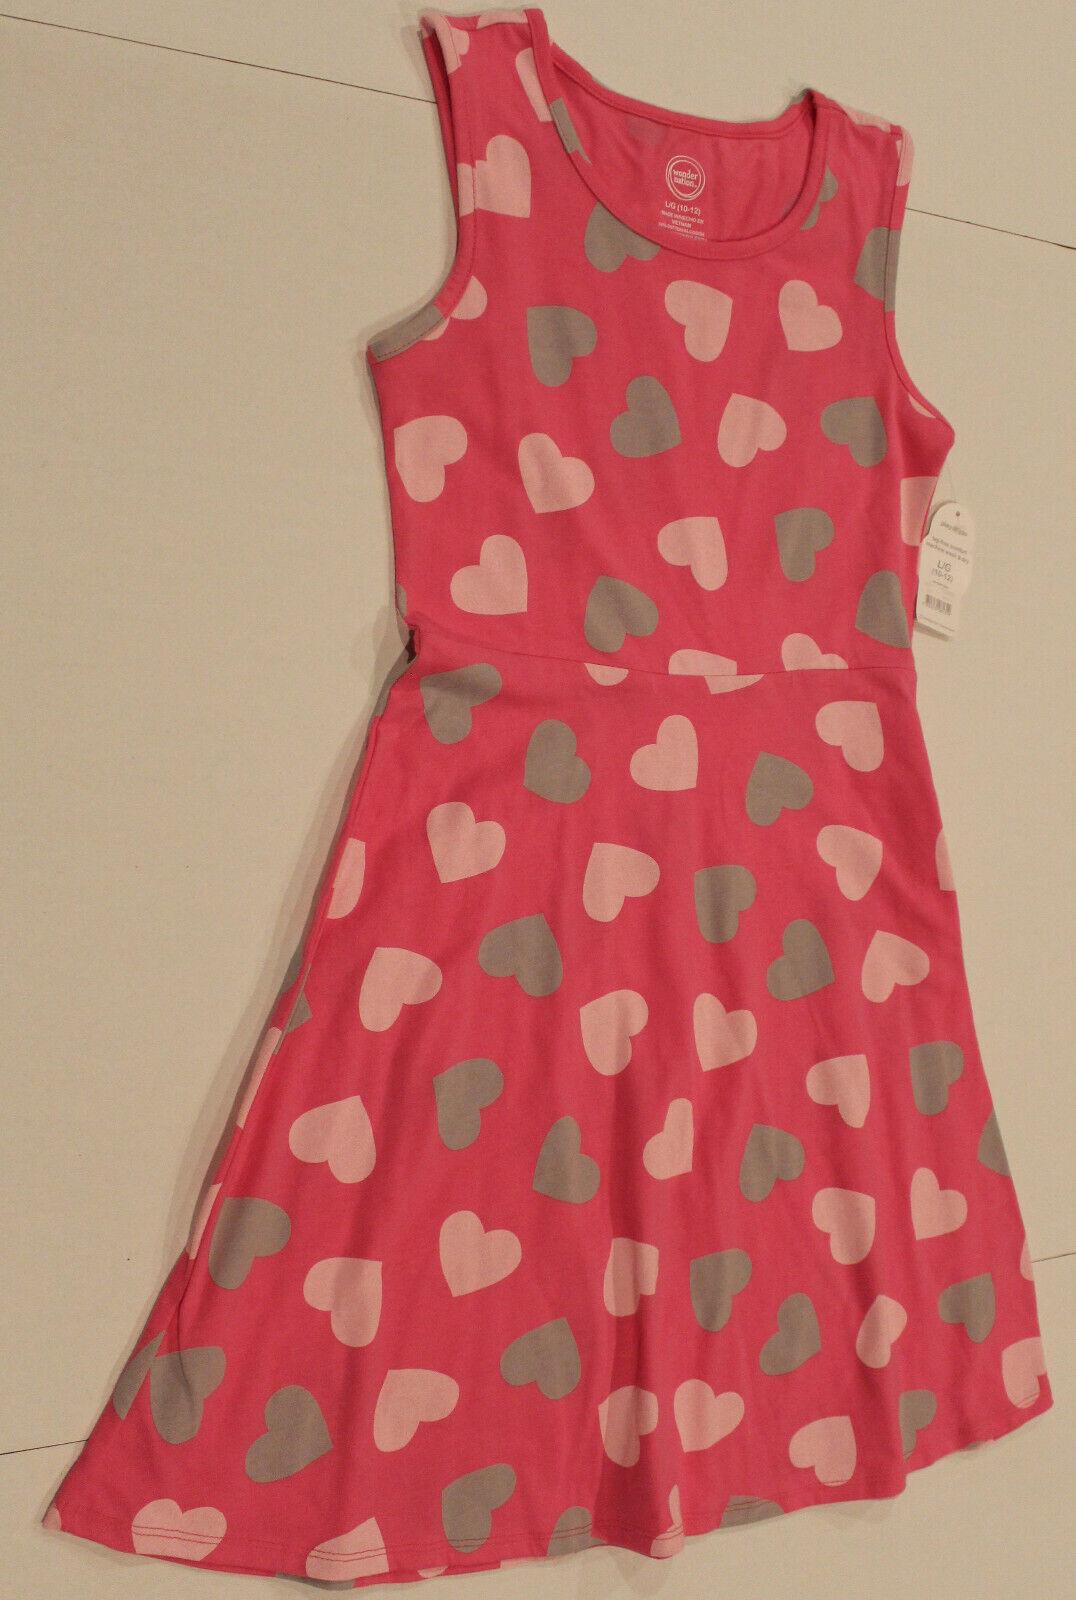 ❤Wonder Nation Girls Pink Sleeveless Summer Dress W/Hearts Size L (10-12) BNWT!